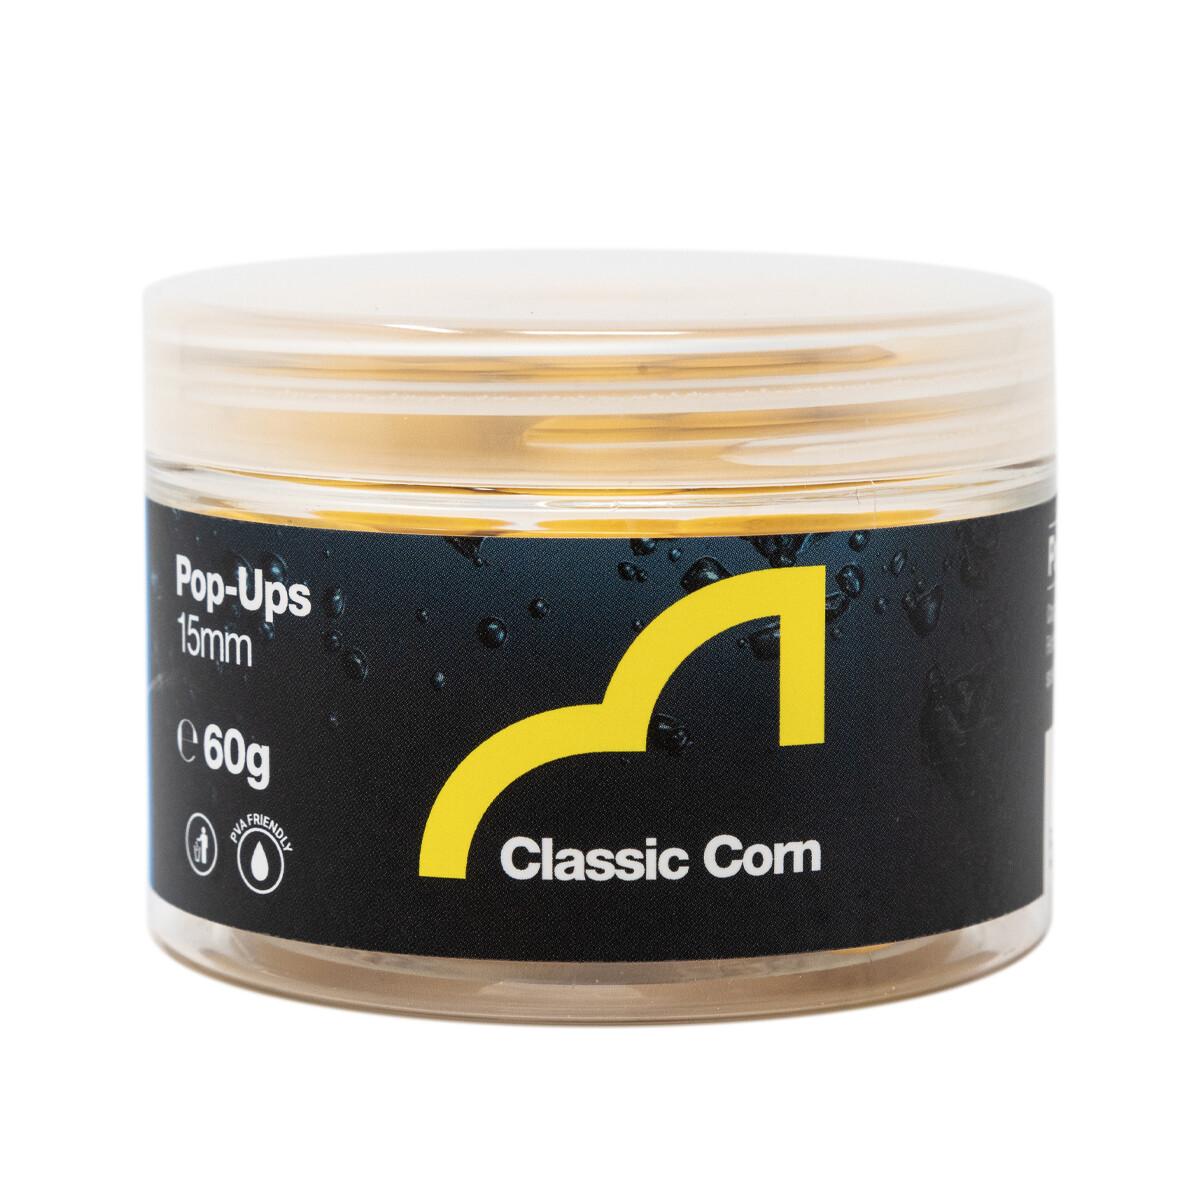 Classic Corn Pop-Ups 15mm